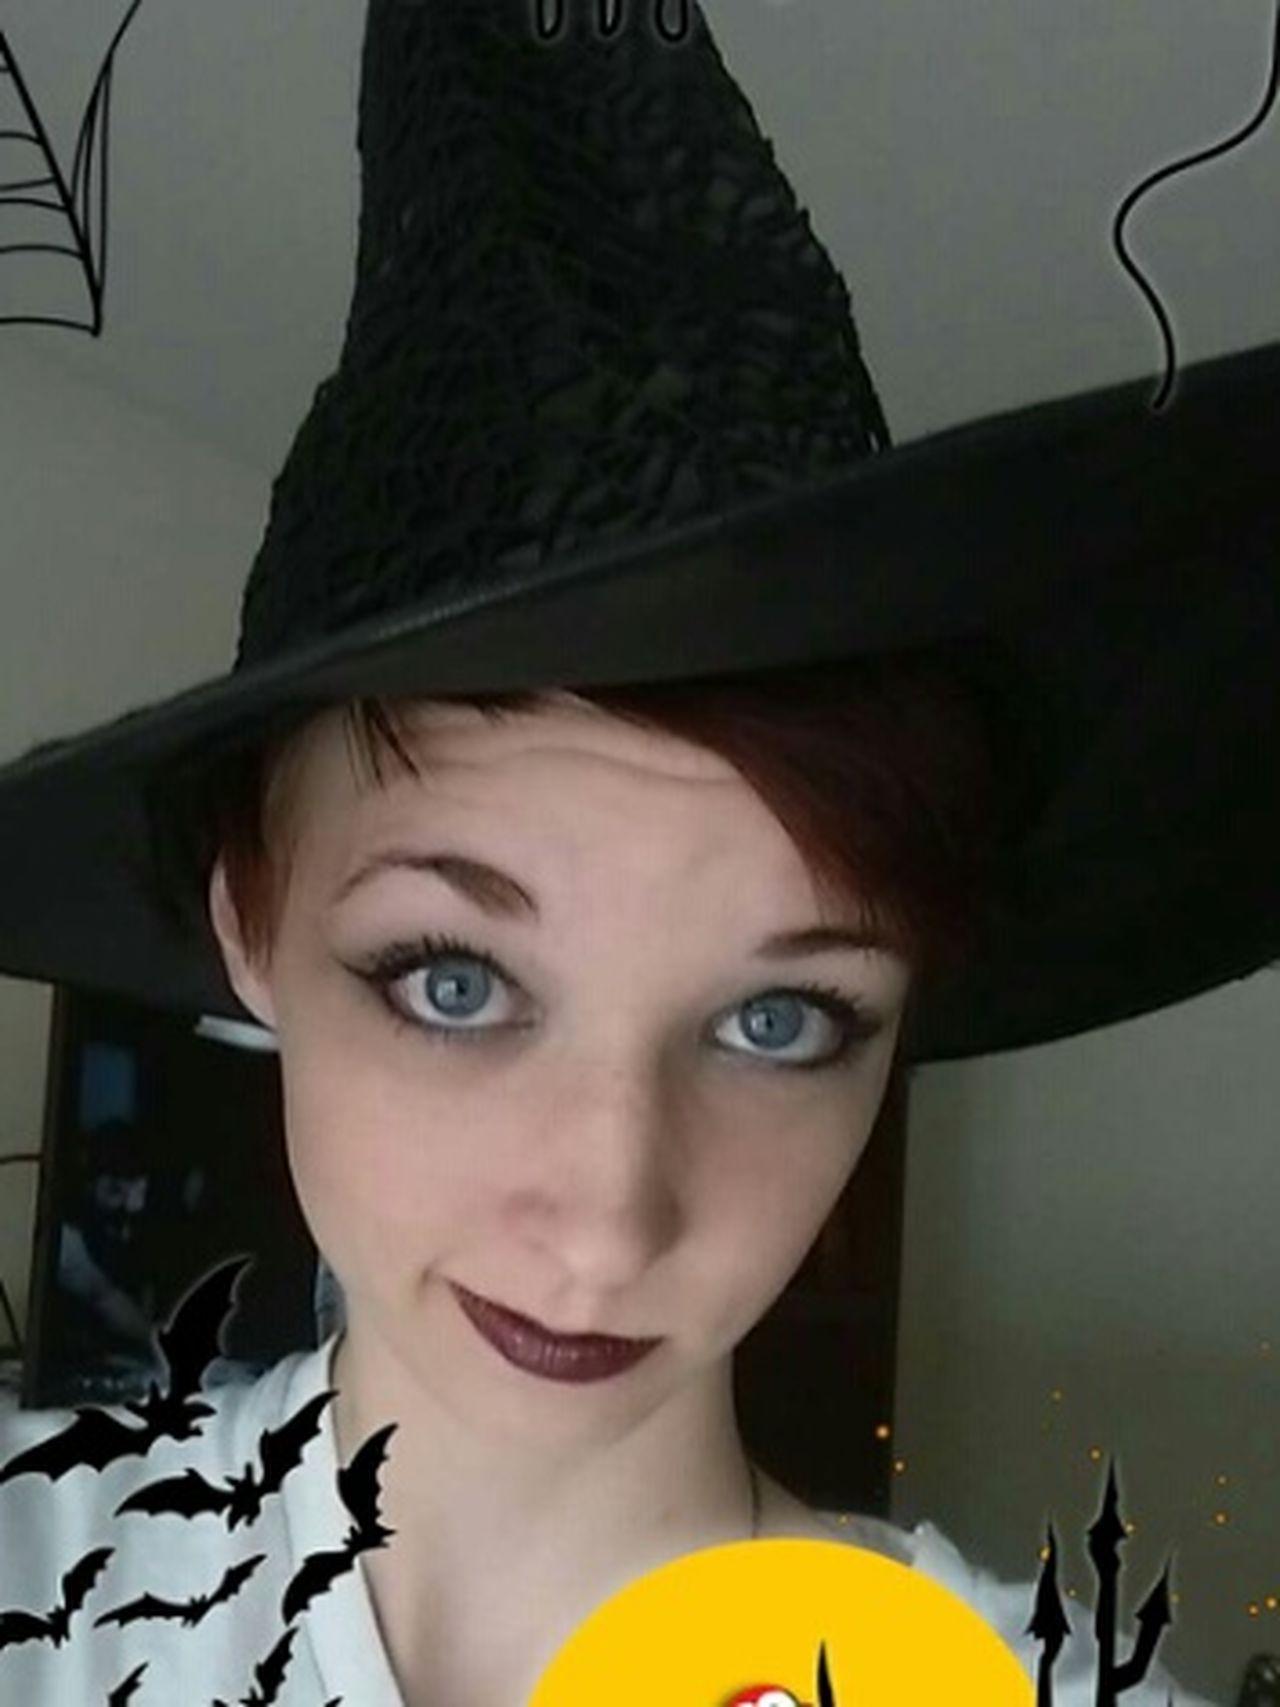 A very beautiful halloween celebrater Friend Pretty Eyes Halloween Beauty Pointed Hat Makeup Girl Pretty Style Fun Happy